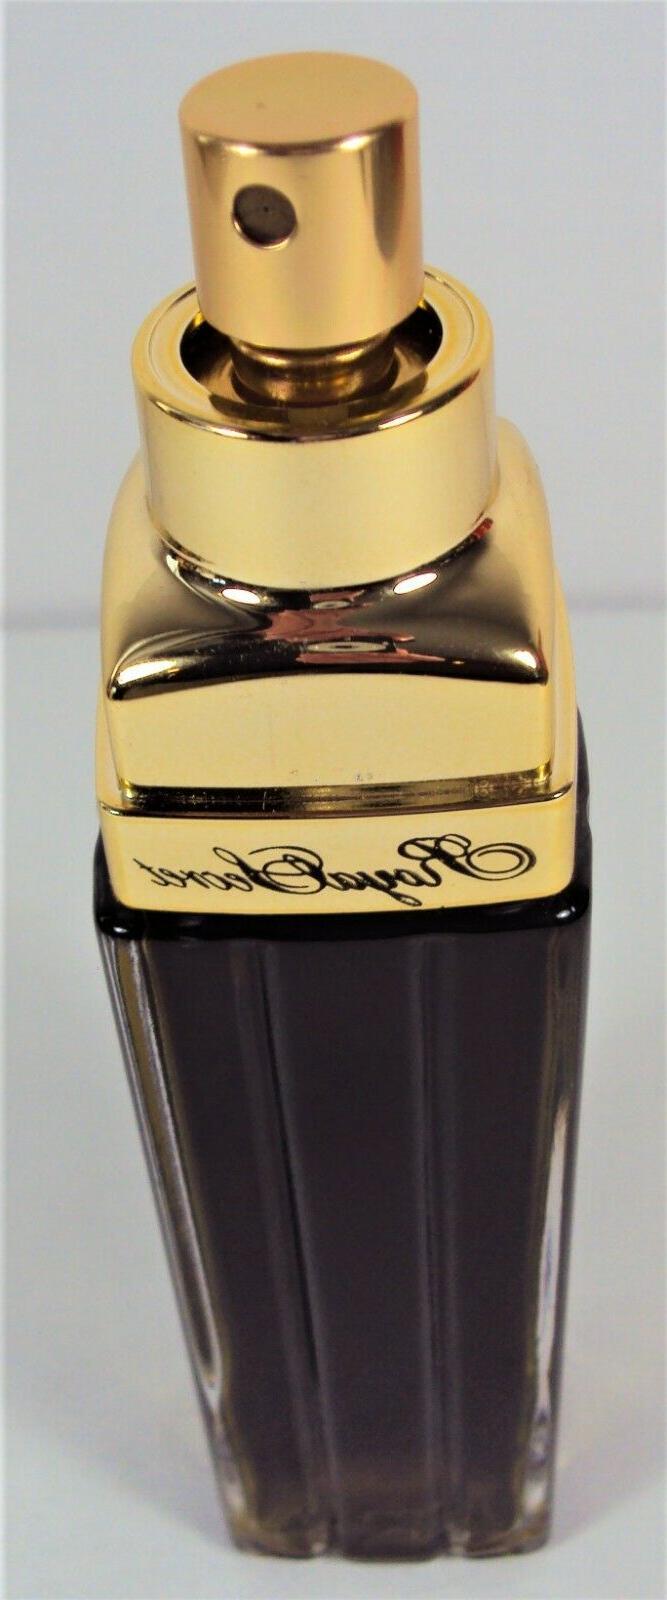 Five Secret Perfume Concentre oz / 100 ml Spray